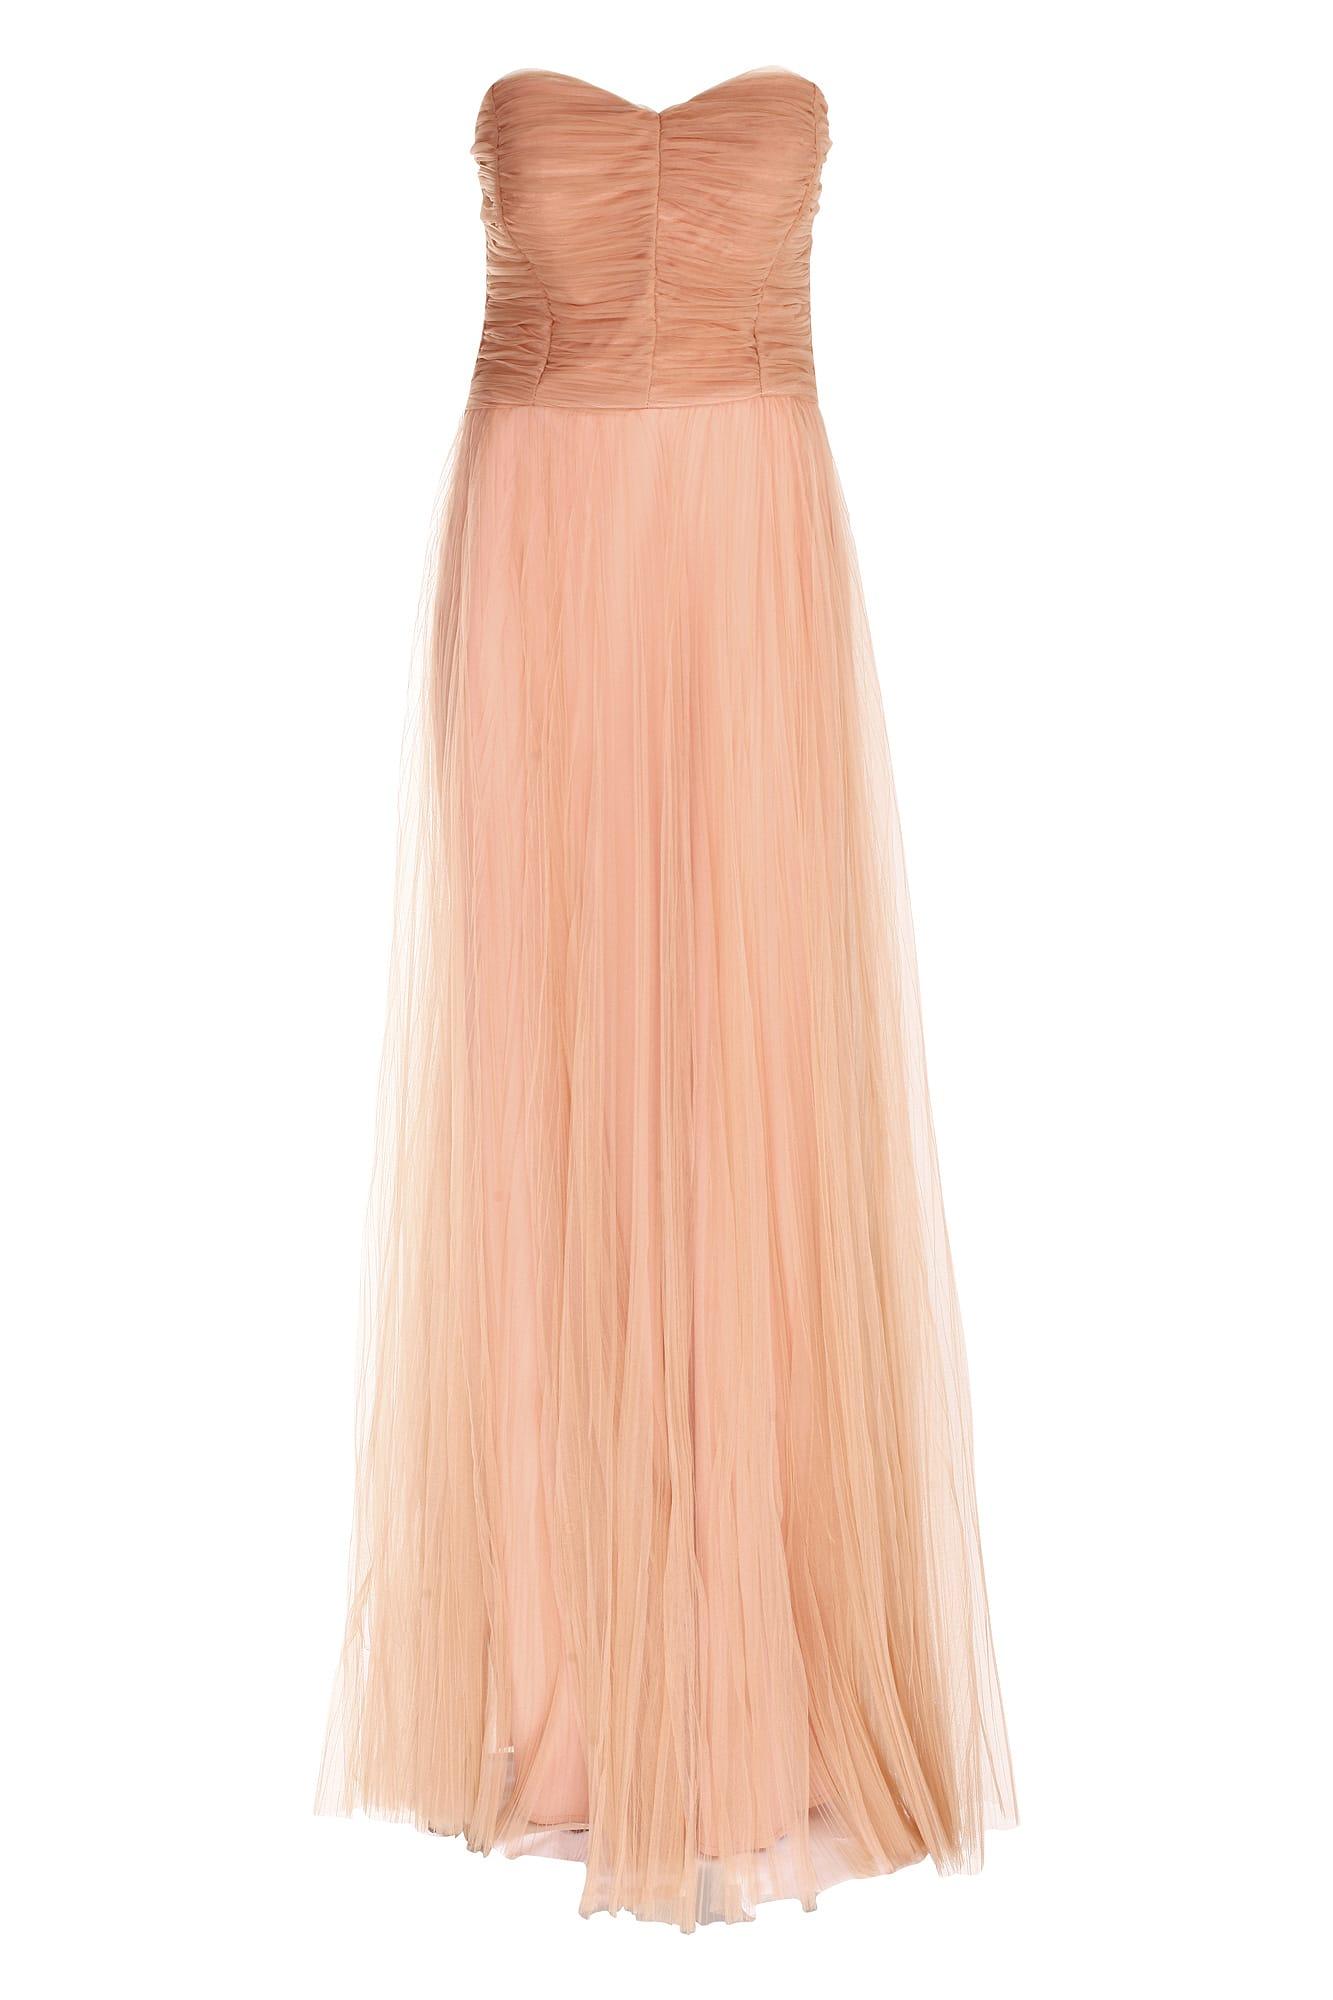 Elisabetta Franchi Red Carpet Dress Elisabetta Franchi